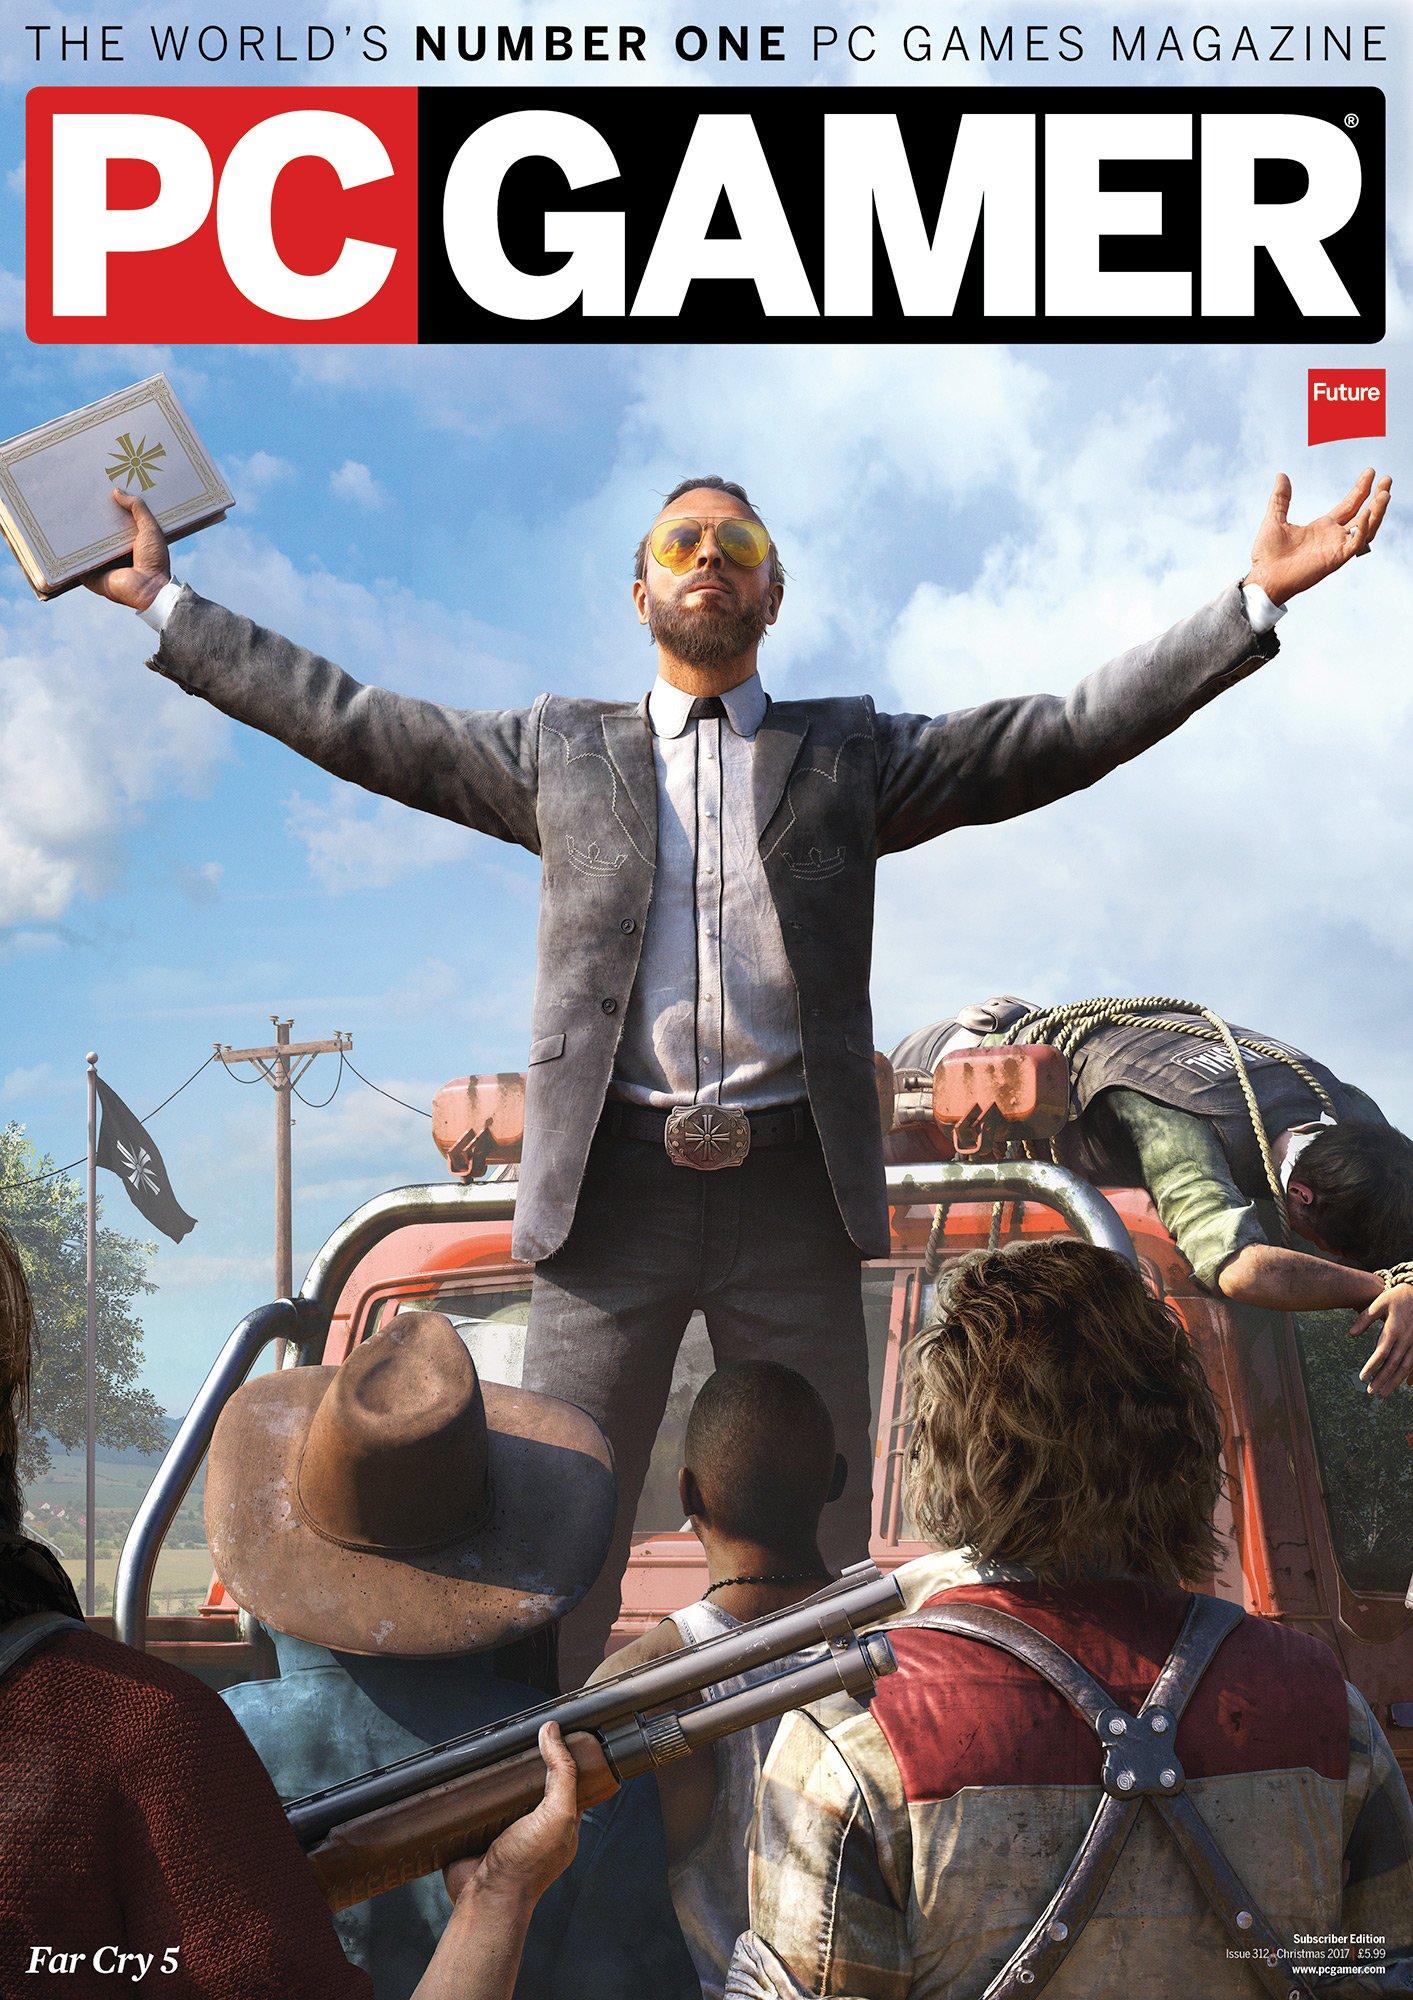 PC Gamer UK 312 (Christmas 2017) (subscriber edition)